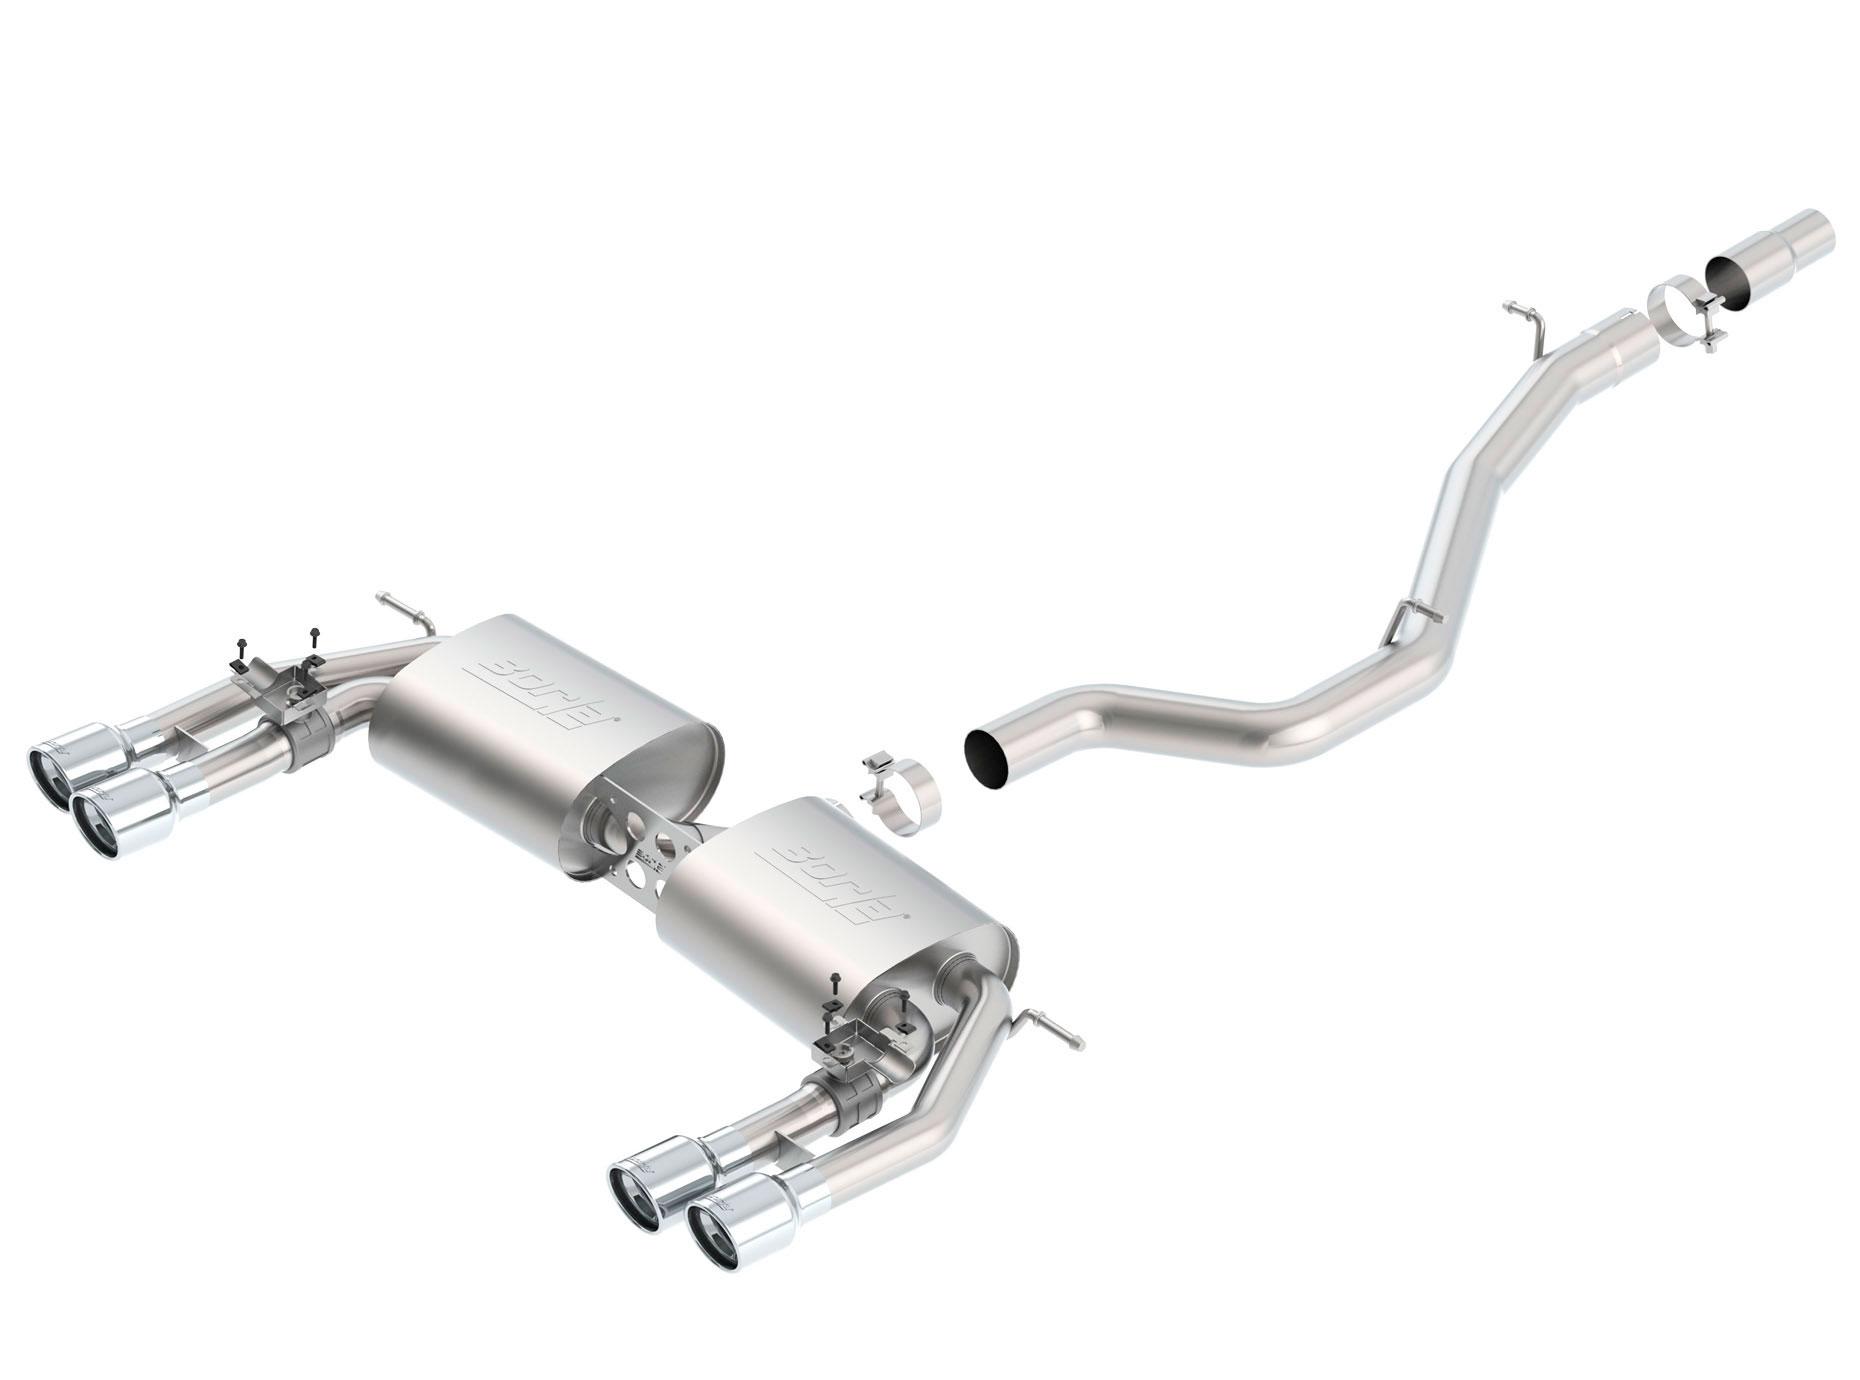 borla 140631 audi s3 s type cat back exhaust system l4 2 0 2015 2019